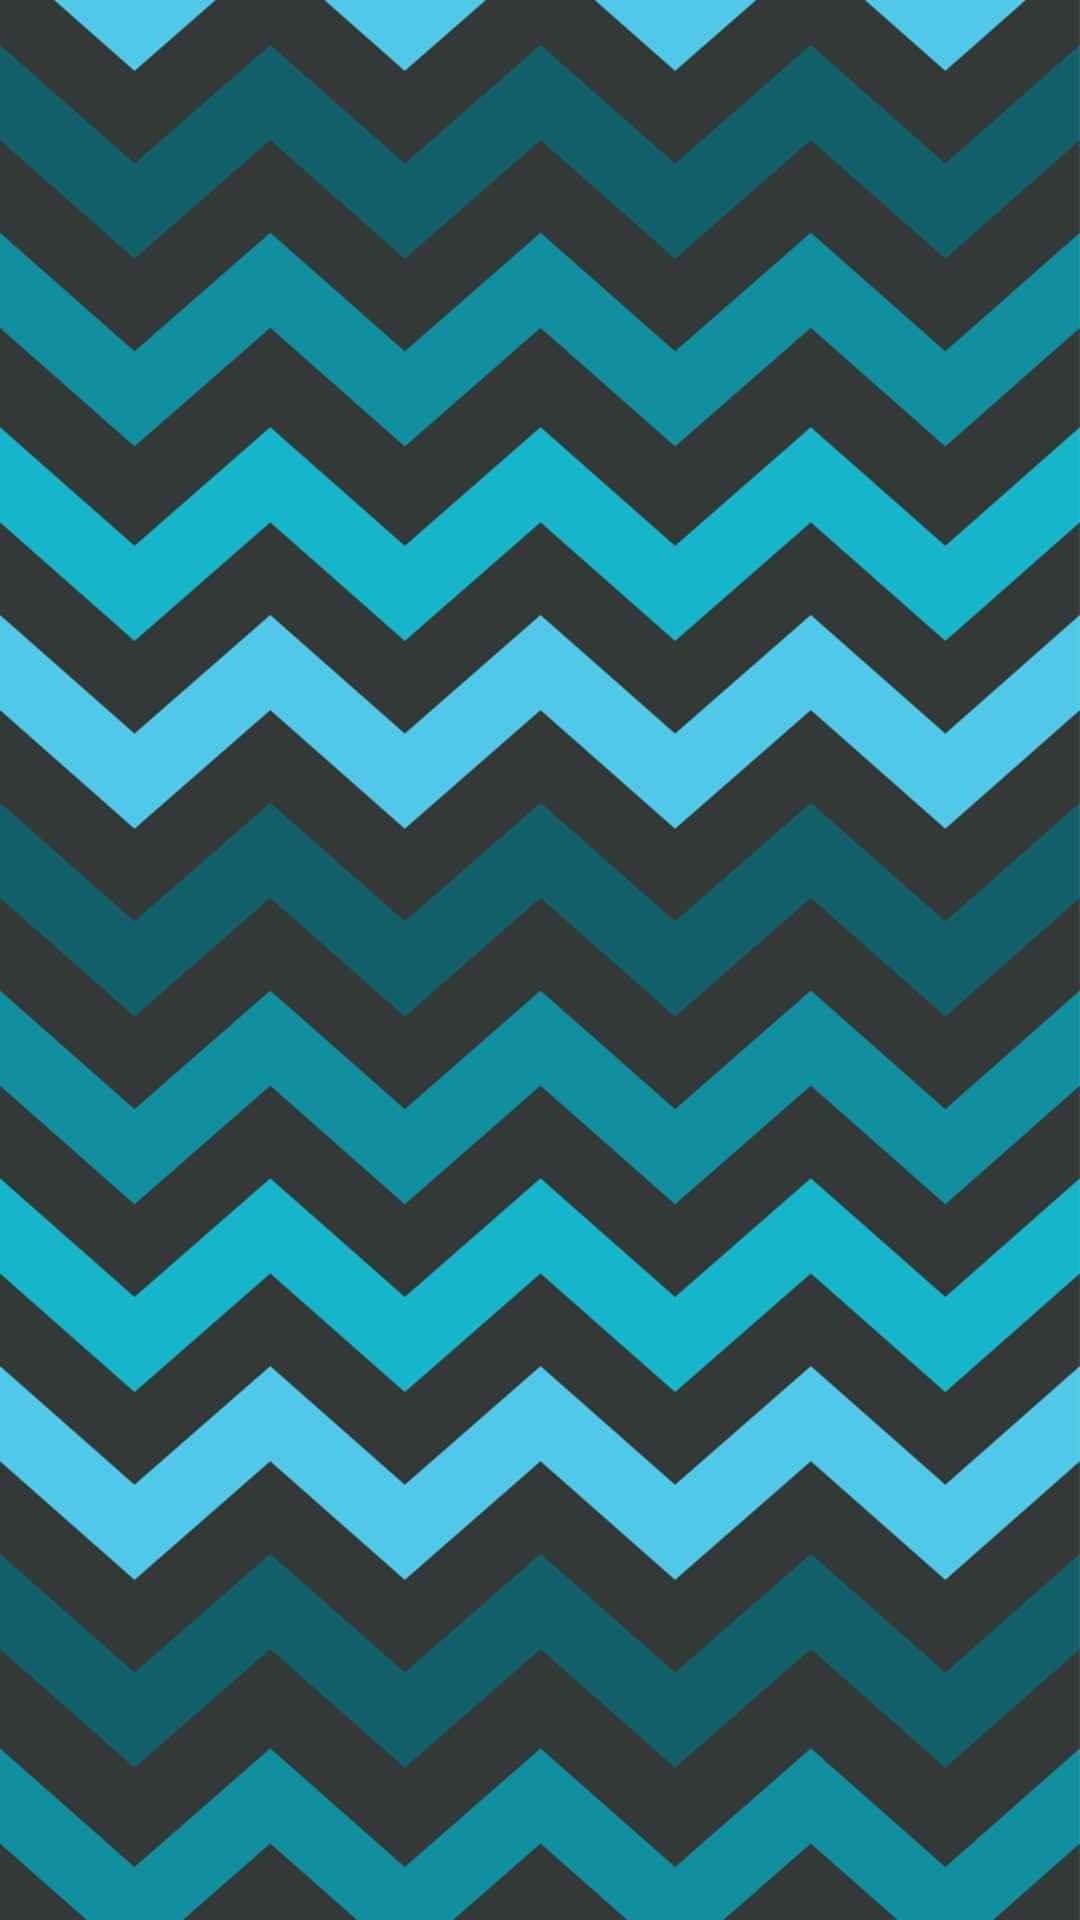 Chevron Dim Blue and Black iPhone 6 Plus Wallpaper – Zigzag .